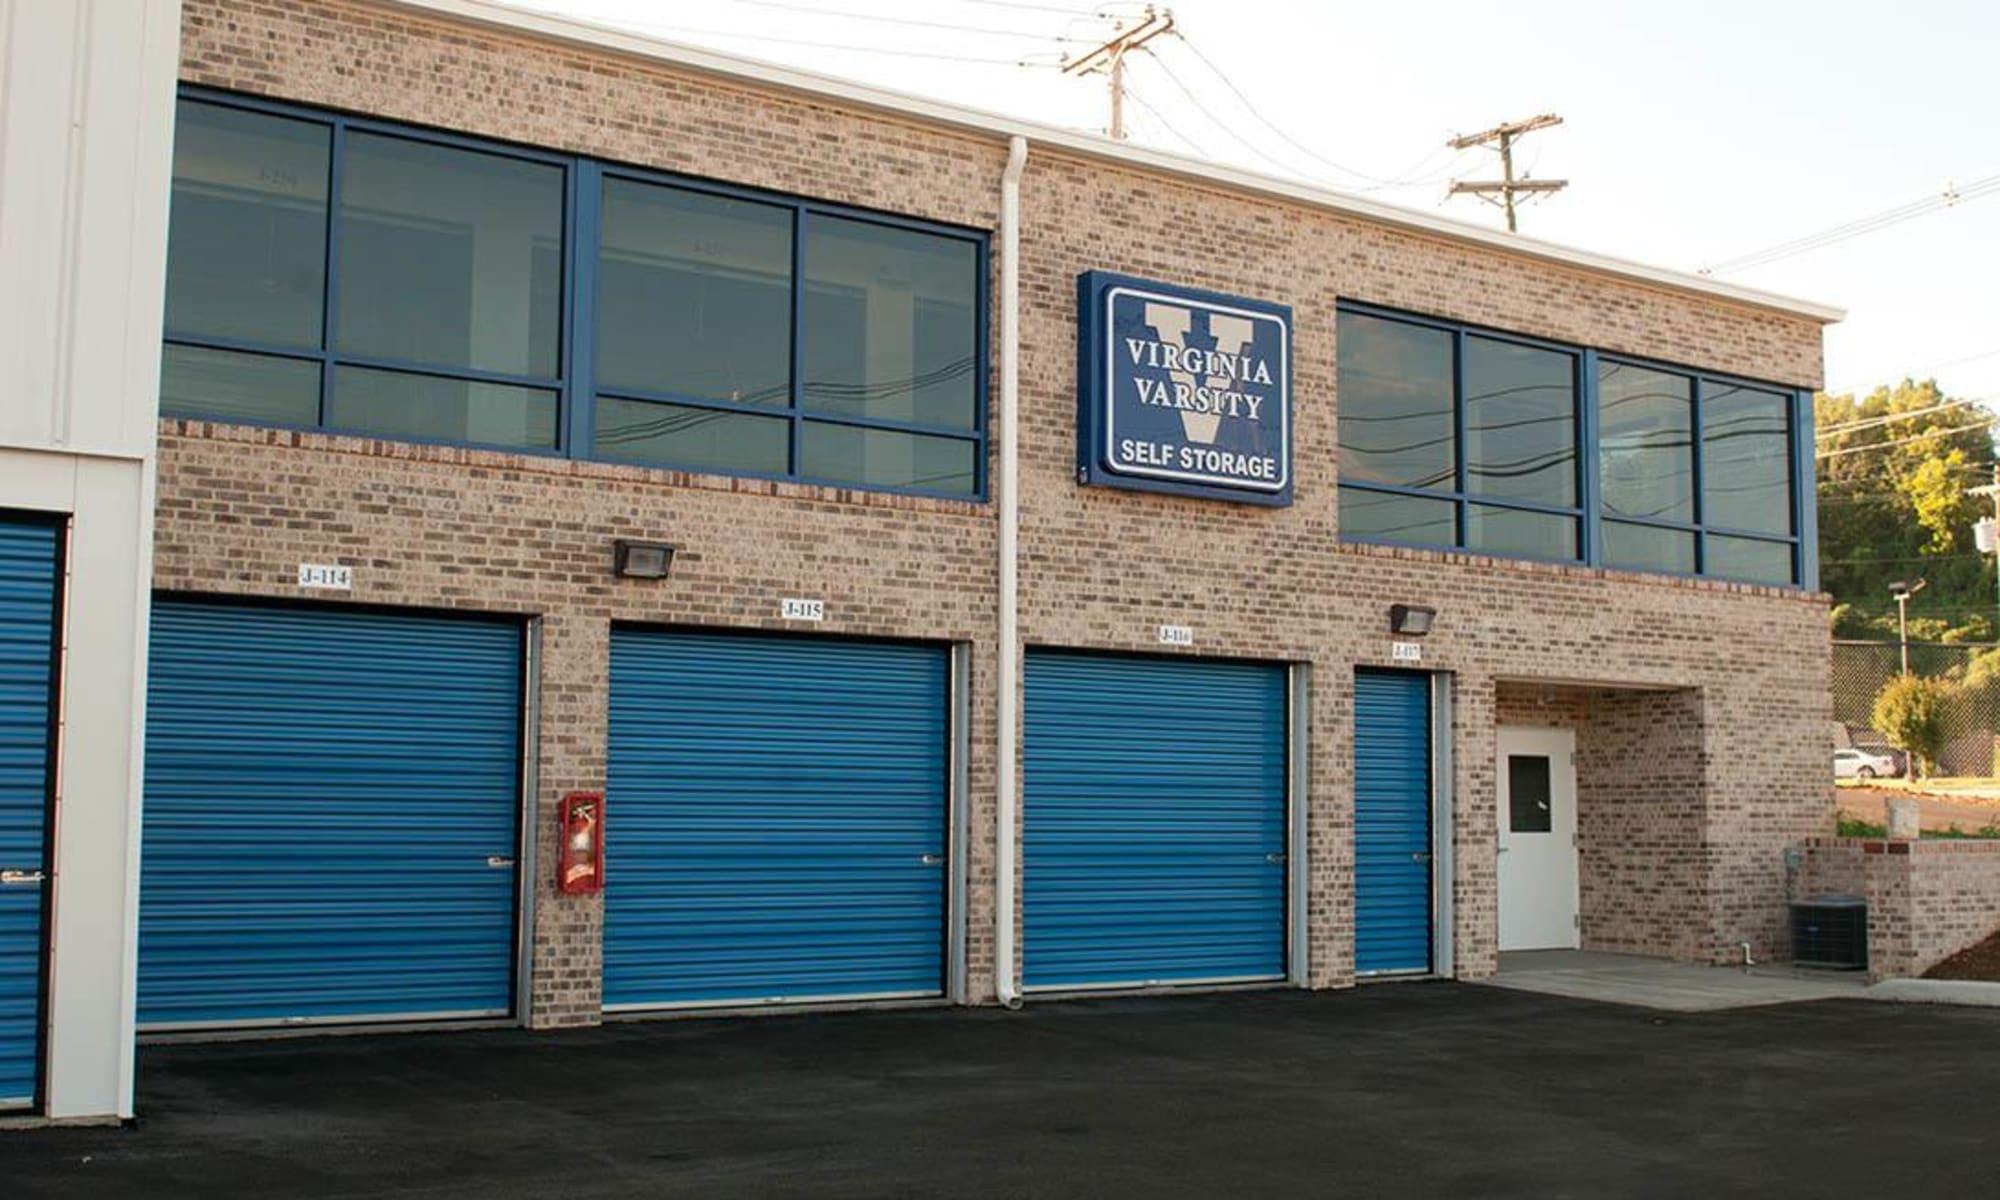 Some exterior self storage units at Virginia Varsity Storage in Salem, Virginia